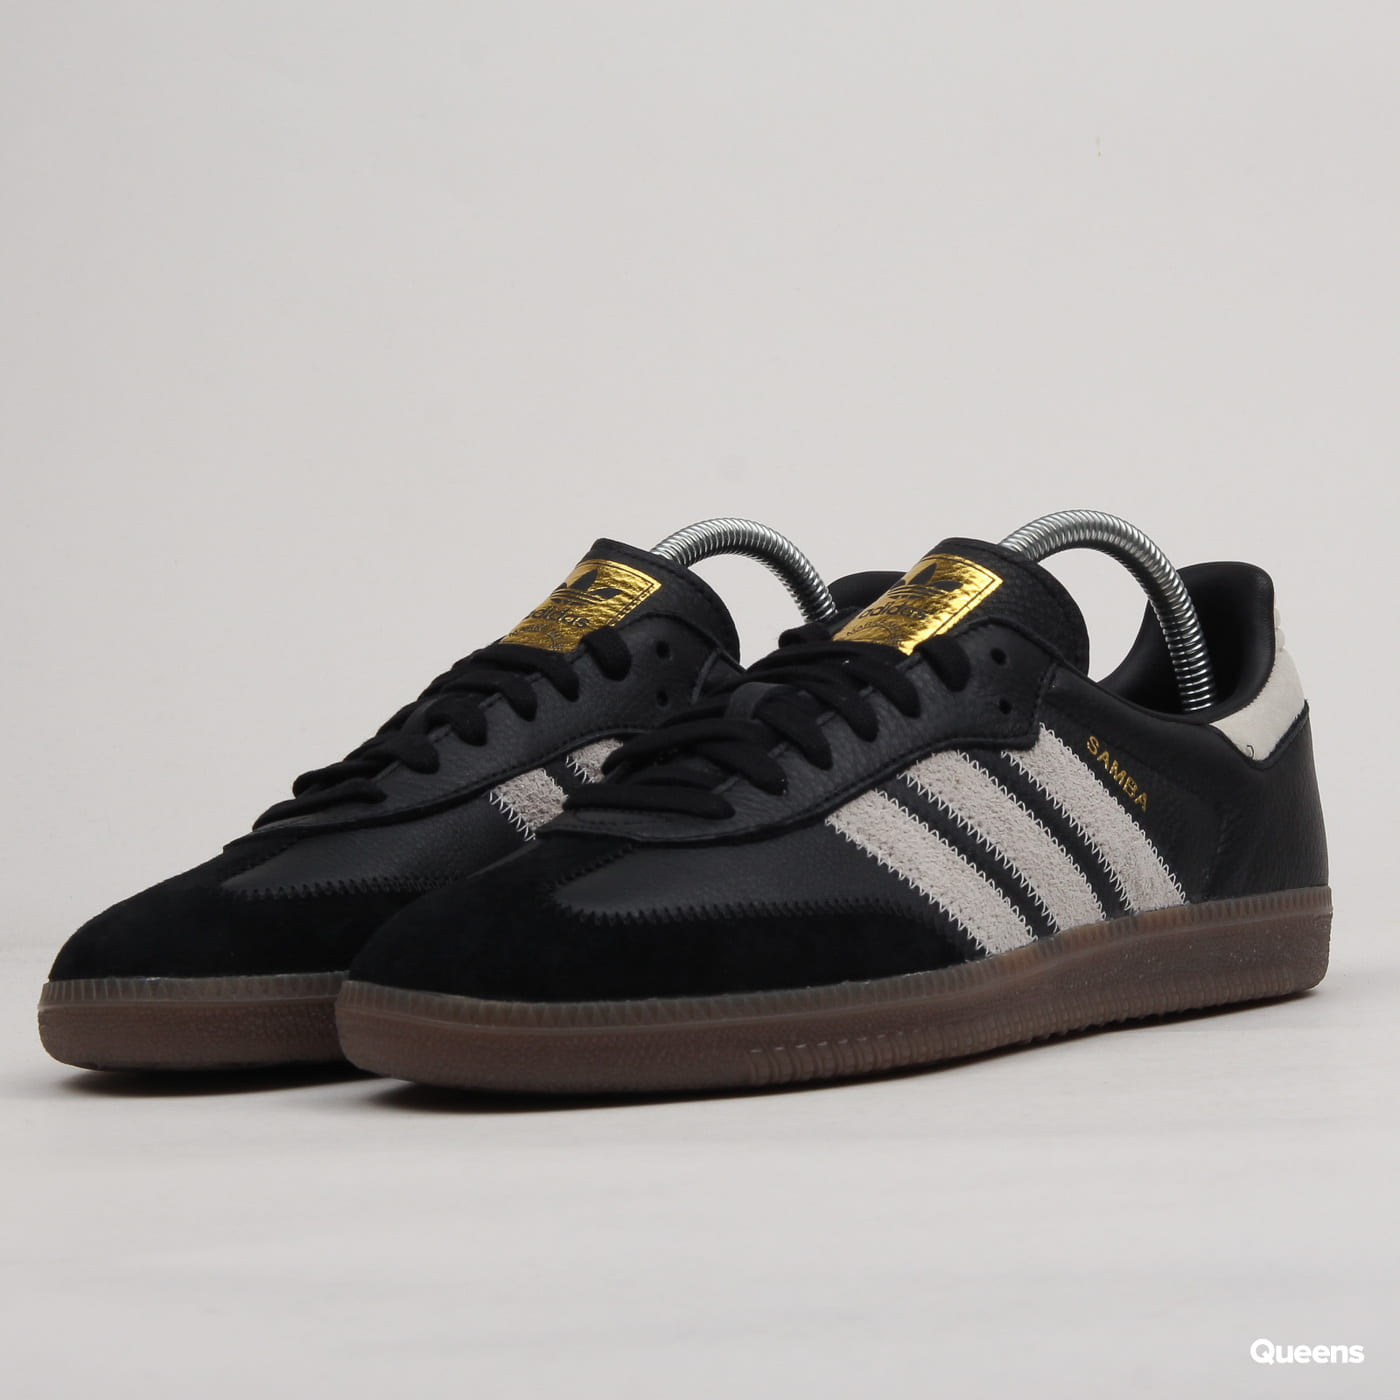 Sneakers adidas Originals Samba OG FT